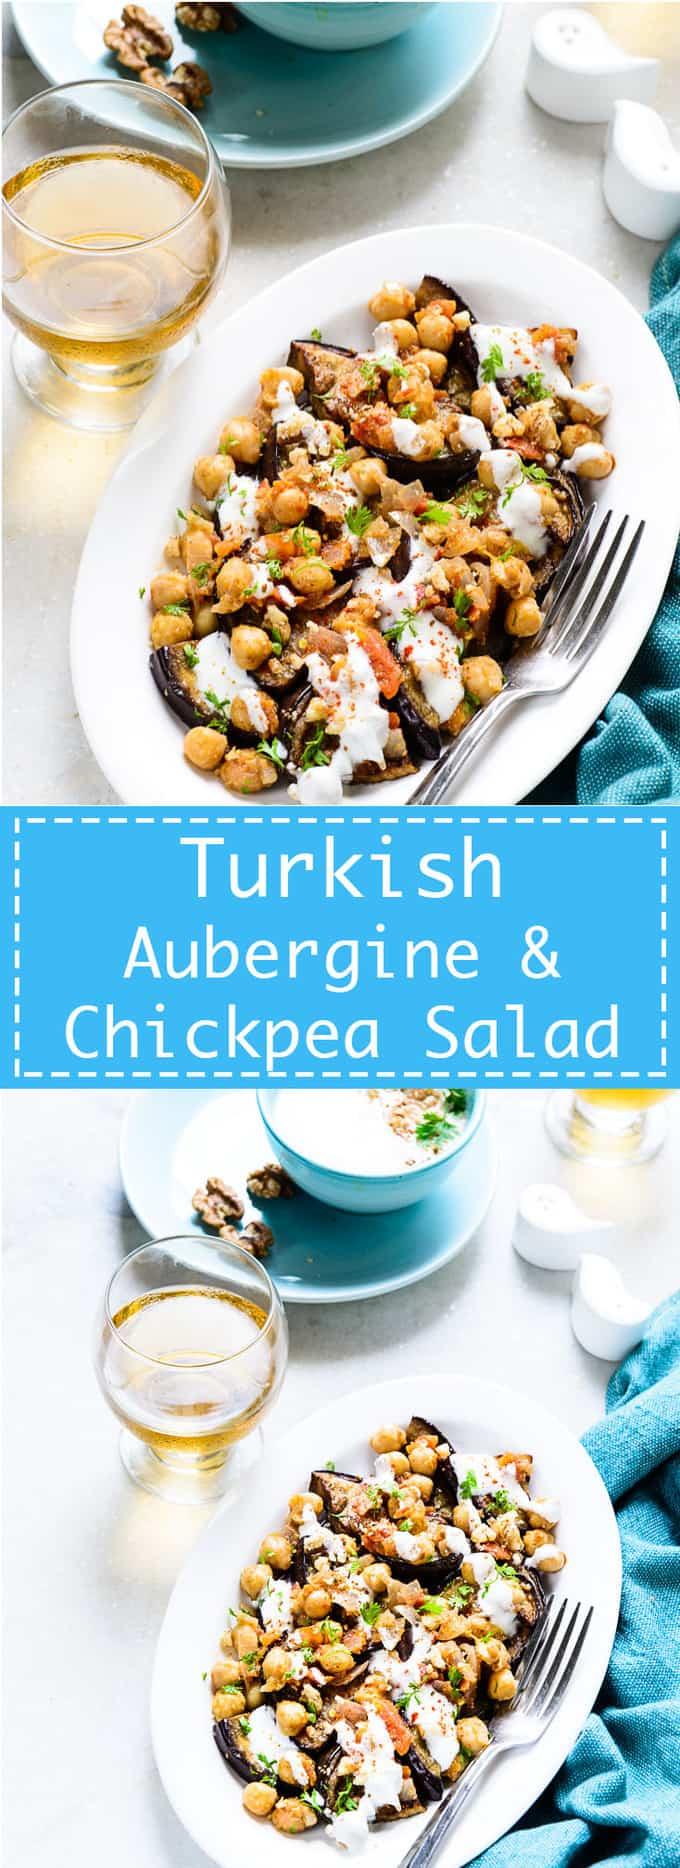 Turkish Aubergine, Chickpea Salad with Walnut Sauce